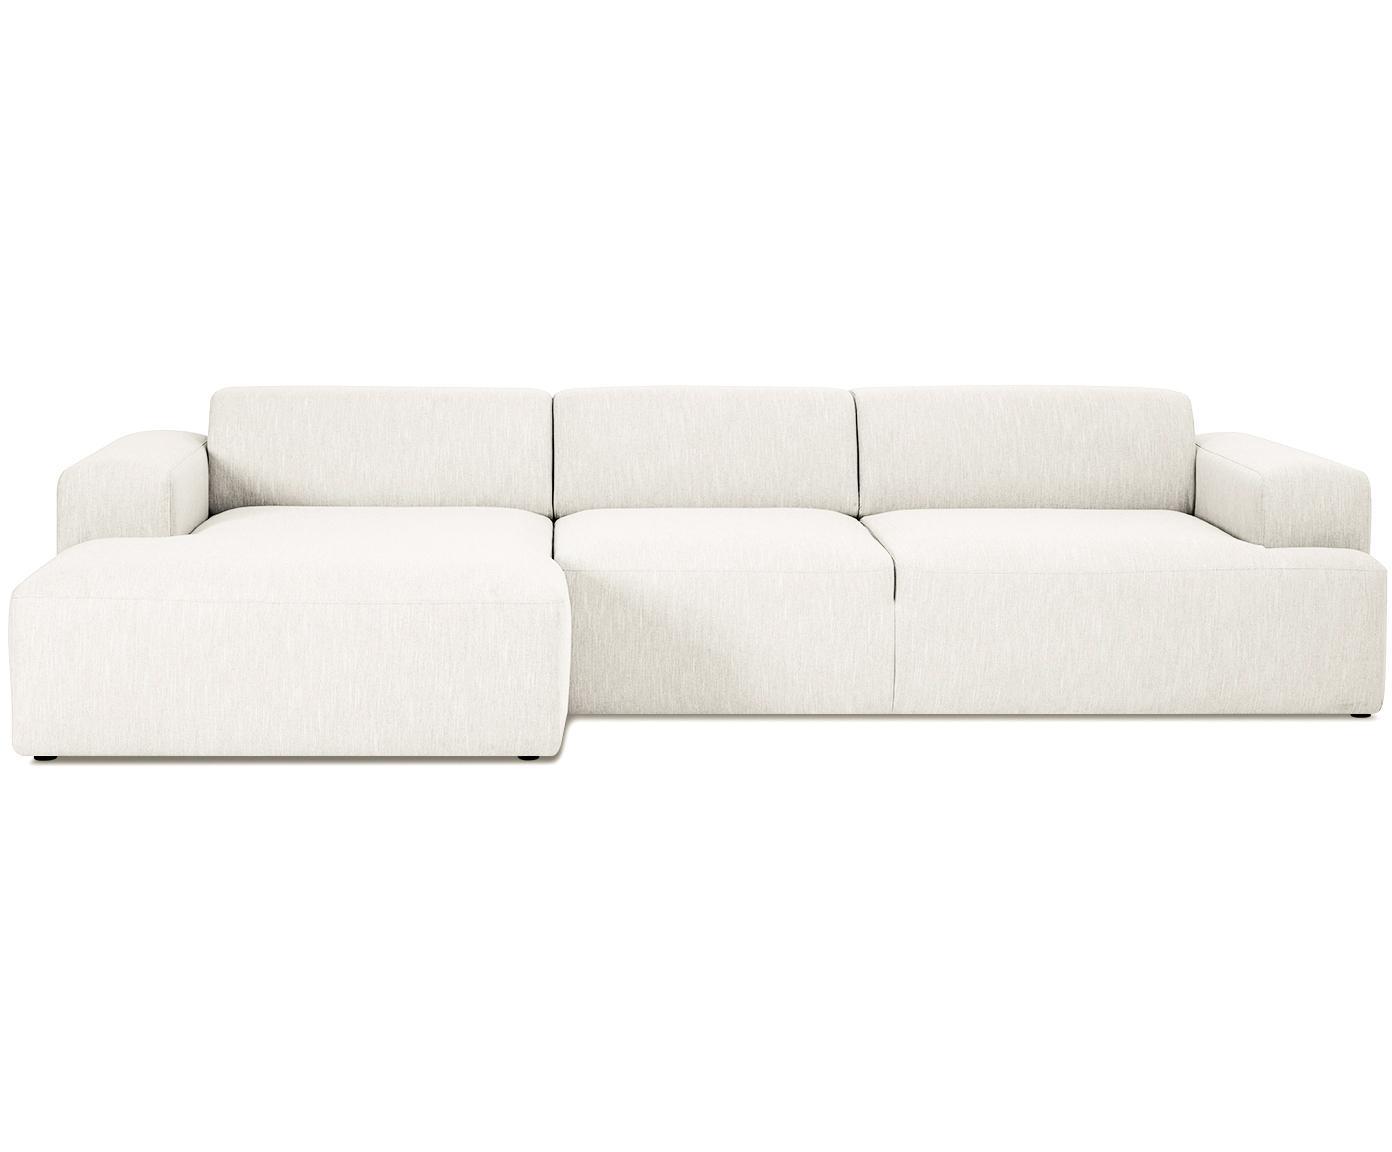 Ecksofa Melva (4-Sitzer), Bezug: Polyester Der hochwertige, Gestell: Massives Kiefernholz, Spa, Webstoff Beige, B 319 x T 144 cm